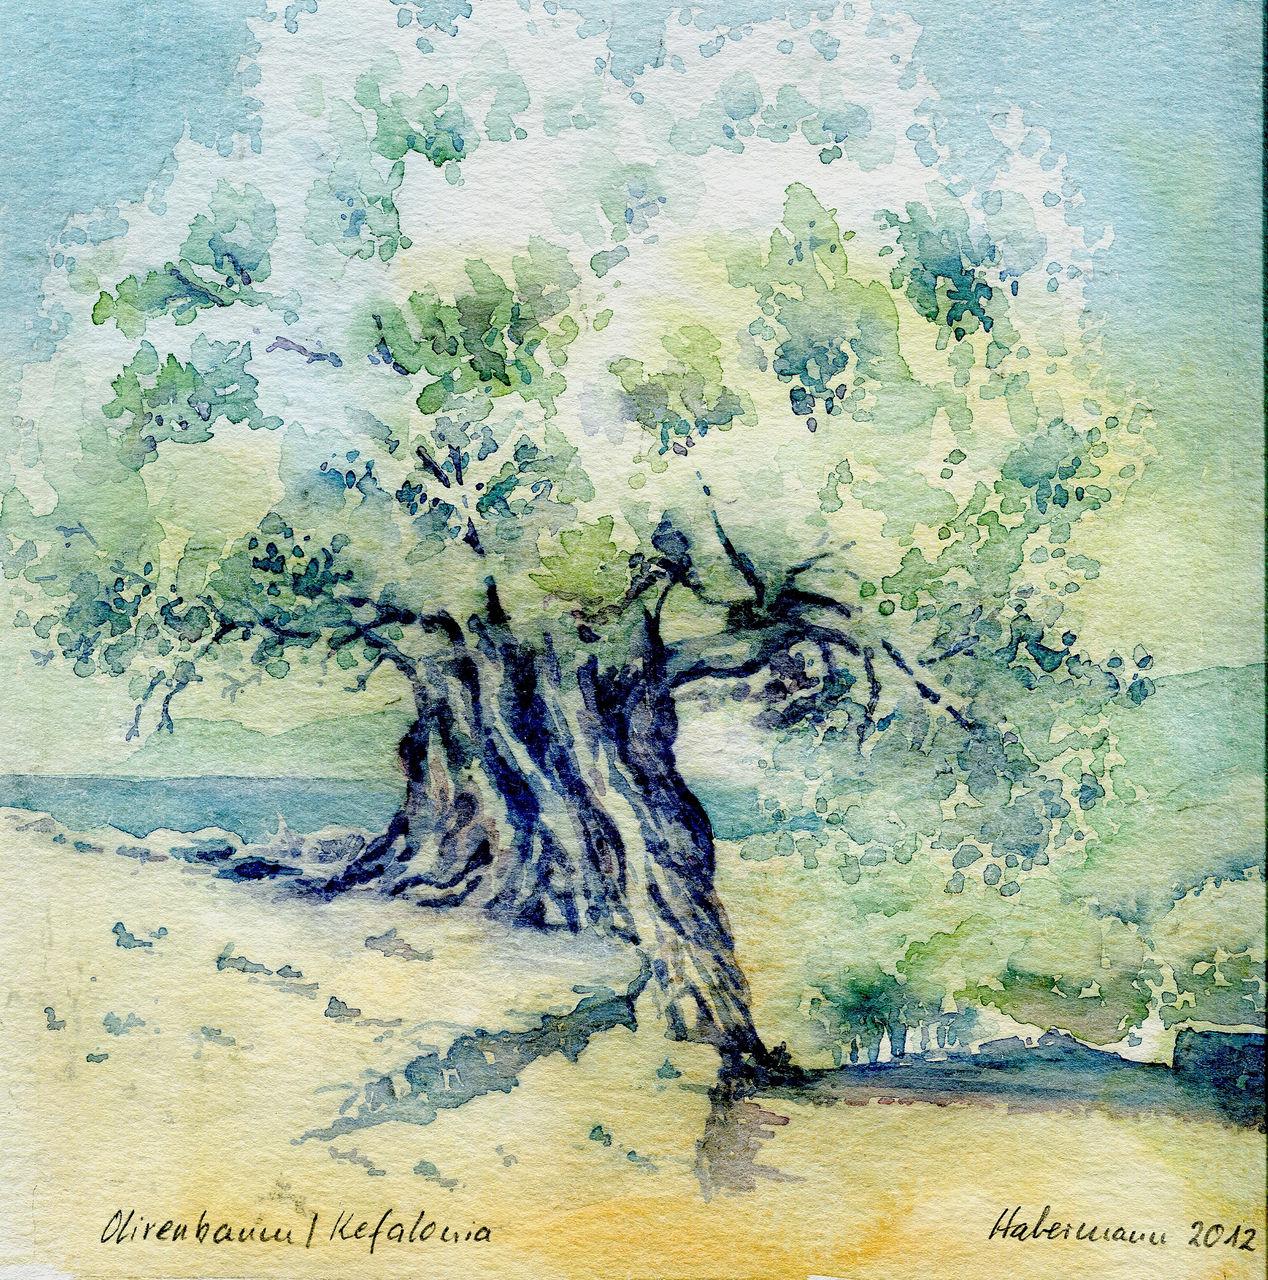 bild kefalonia griechenland olivenbaum aquarellmalerei. Black Bedroom Furniture Sets. Home Design Ideas